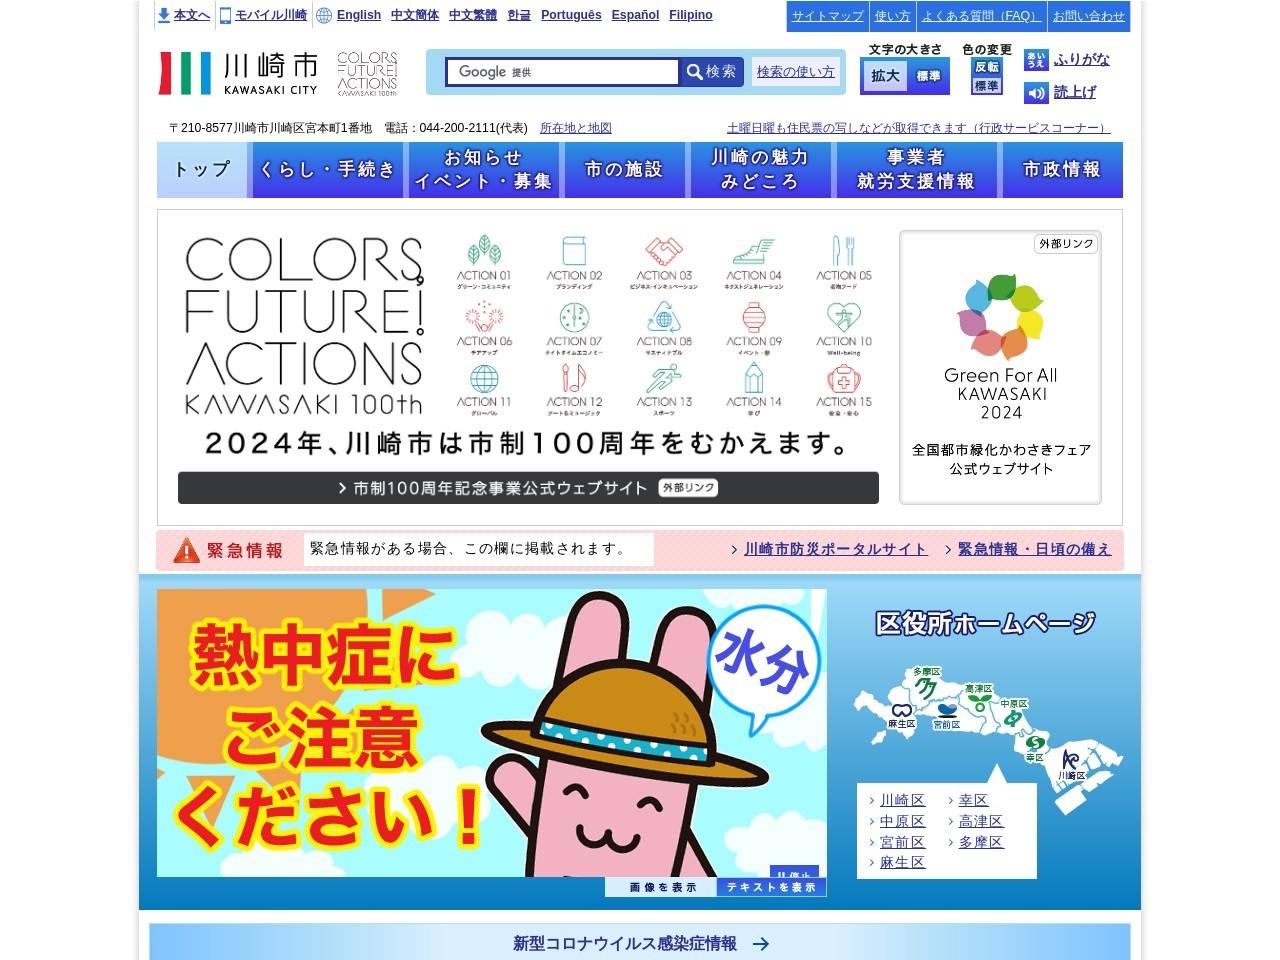 http://www.city.kawasaki.jp/280/page/0000090690.html